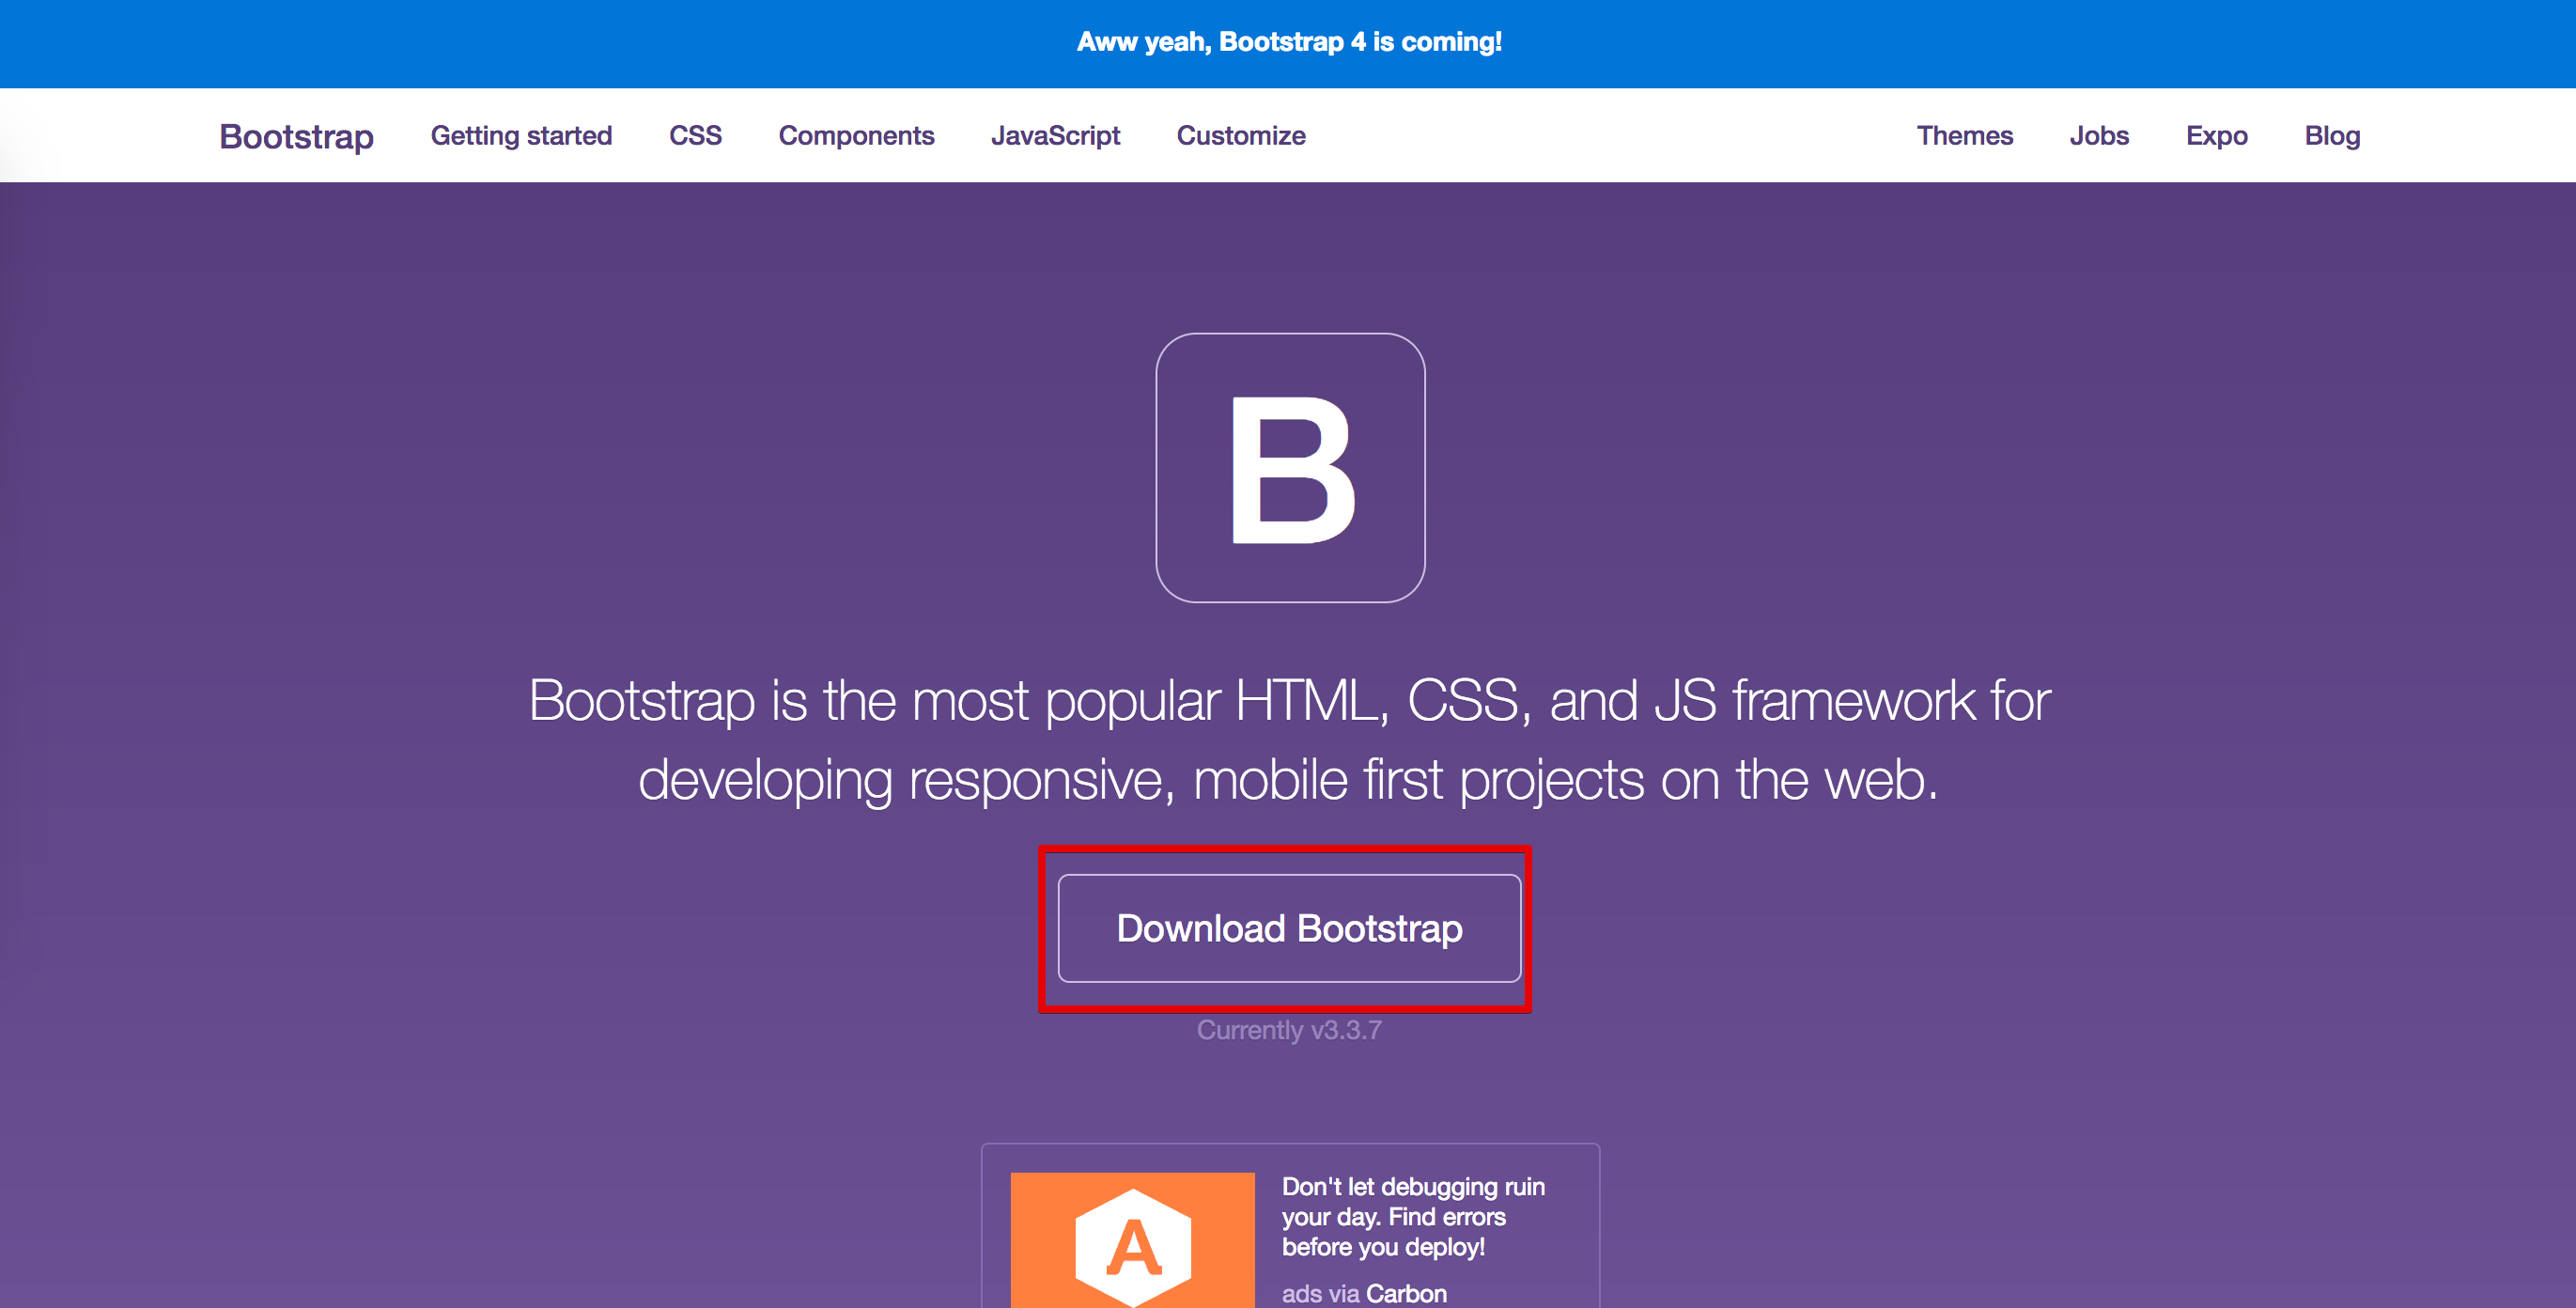 boot - WordPress初心者にオススメ。Bootstrapで楽々CSSが書けるので使い方を簡単に解説